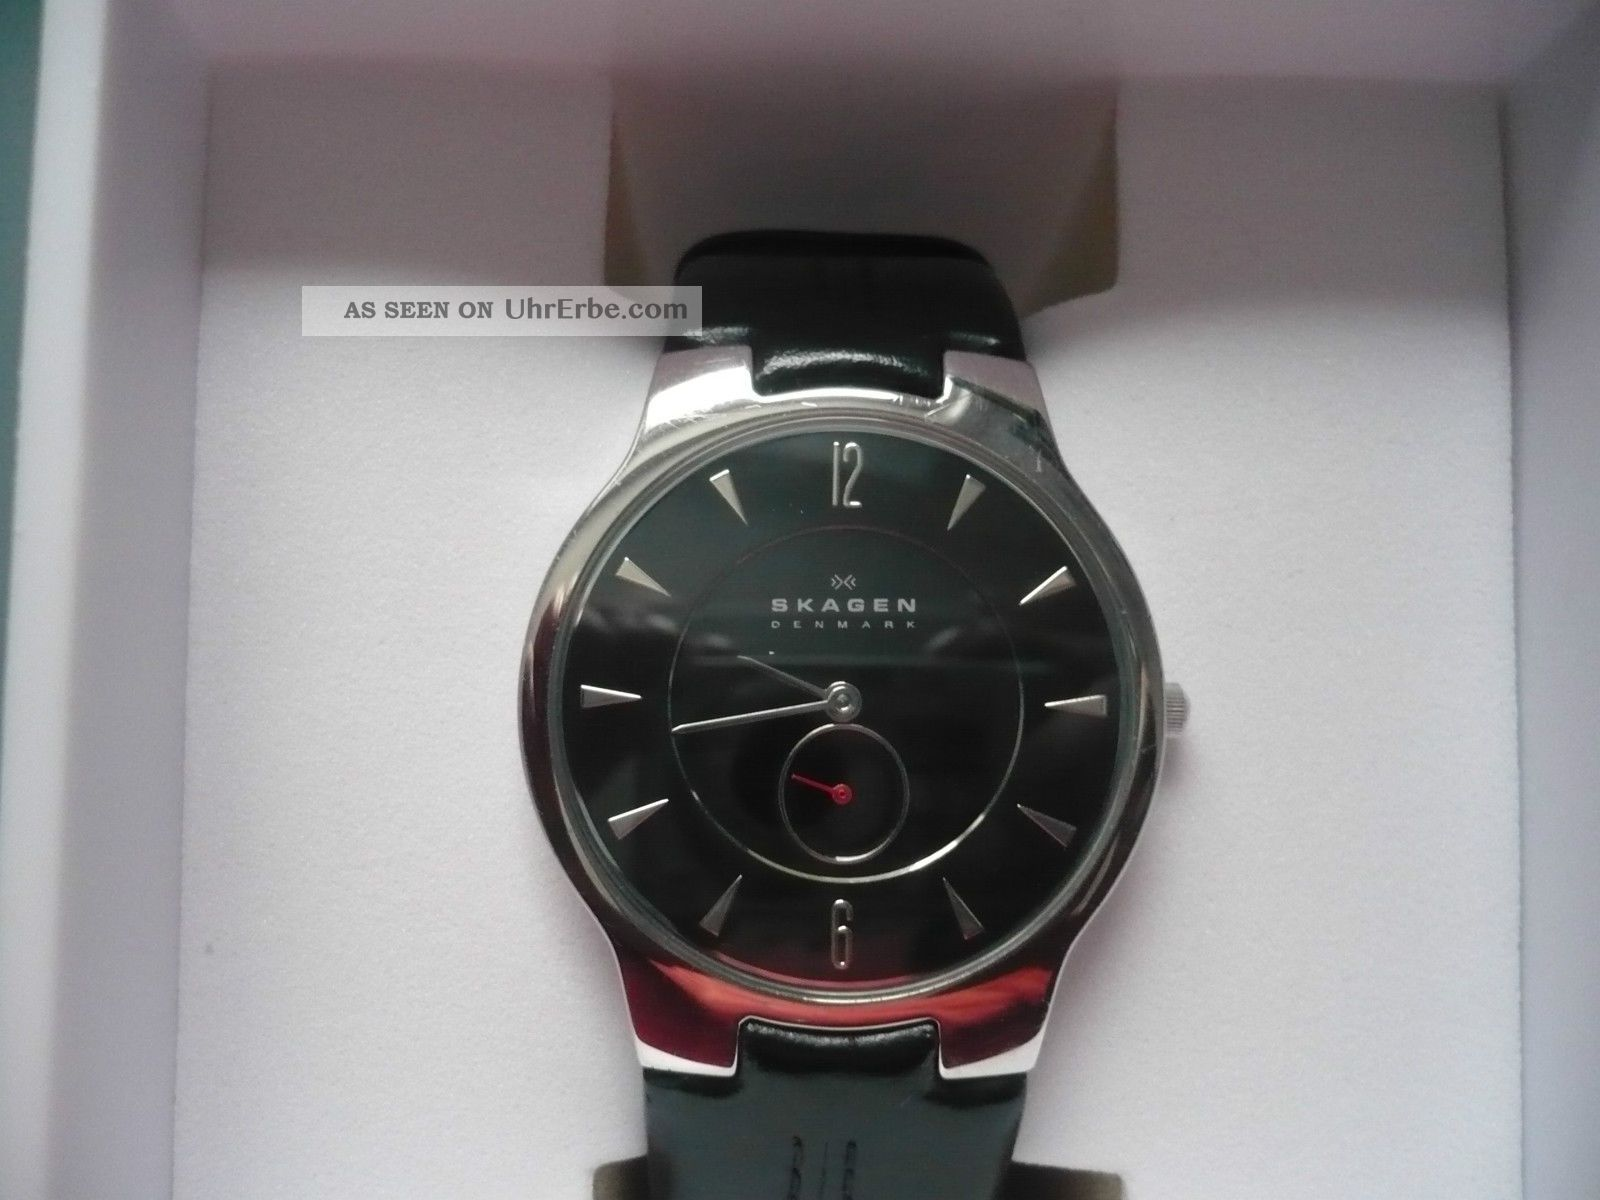 Skagen Slimline Silber Lederarmband Armbanduhren Bild